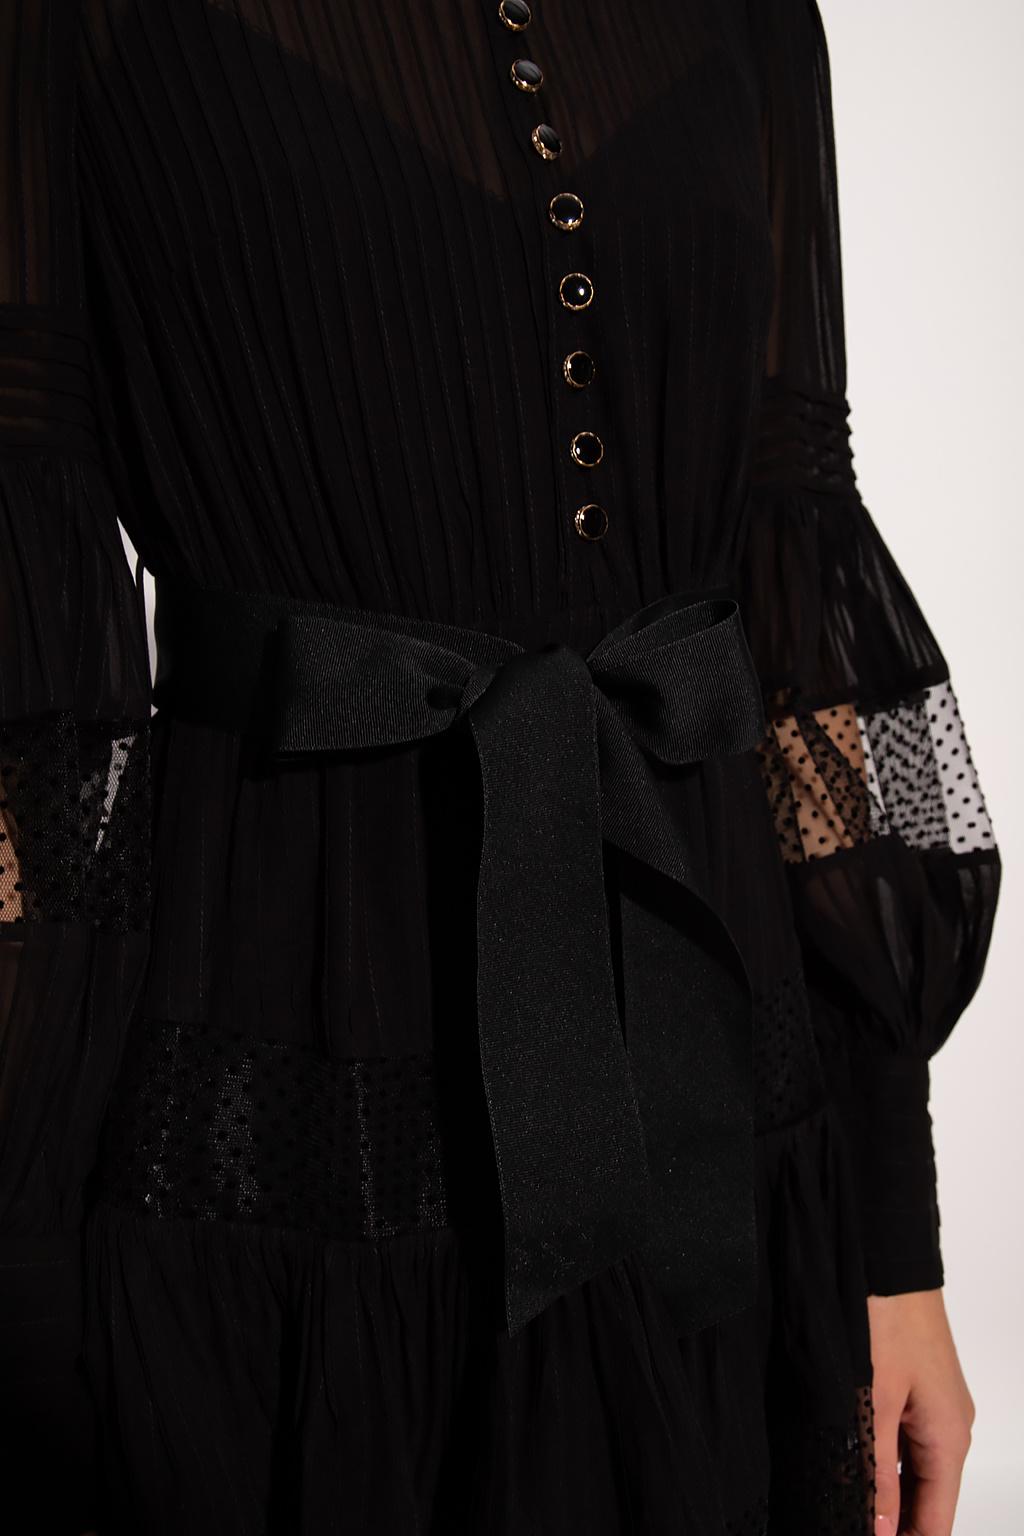 Zimmermann Transparent dress with tie detail